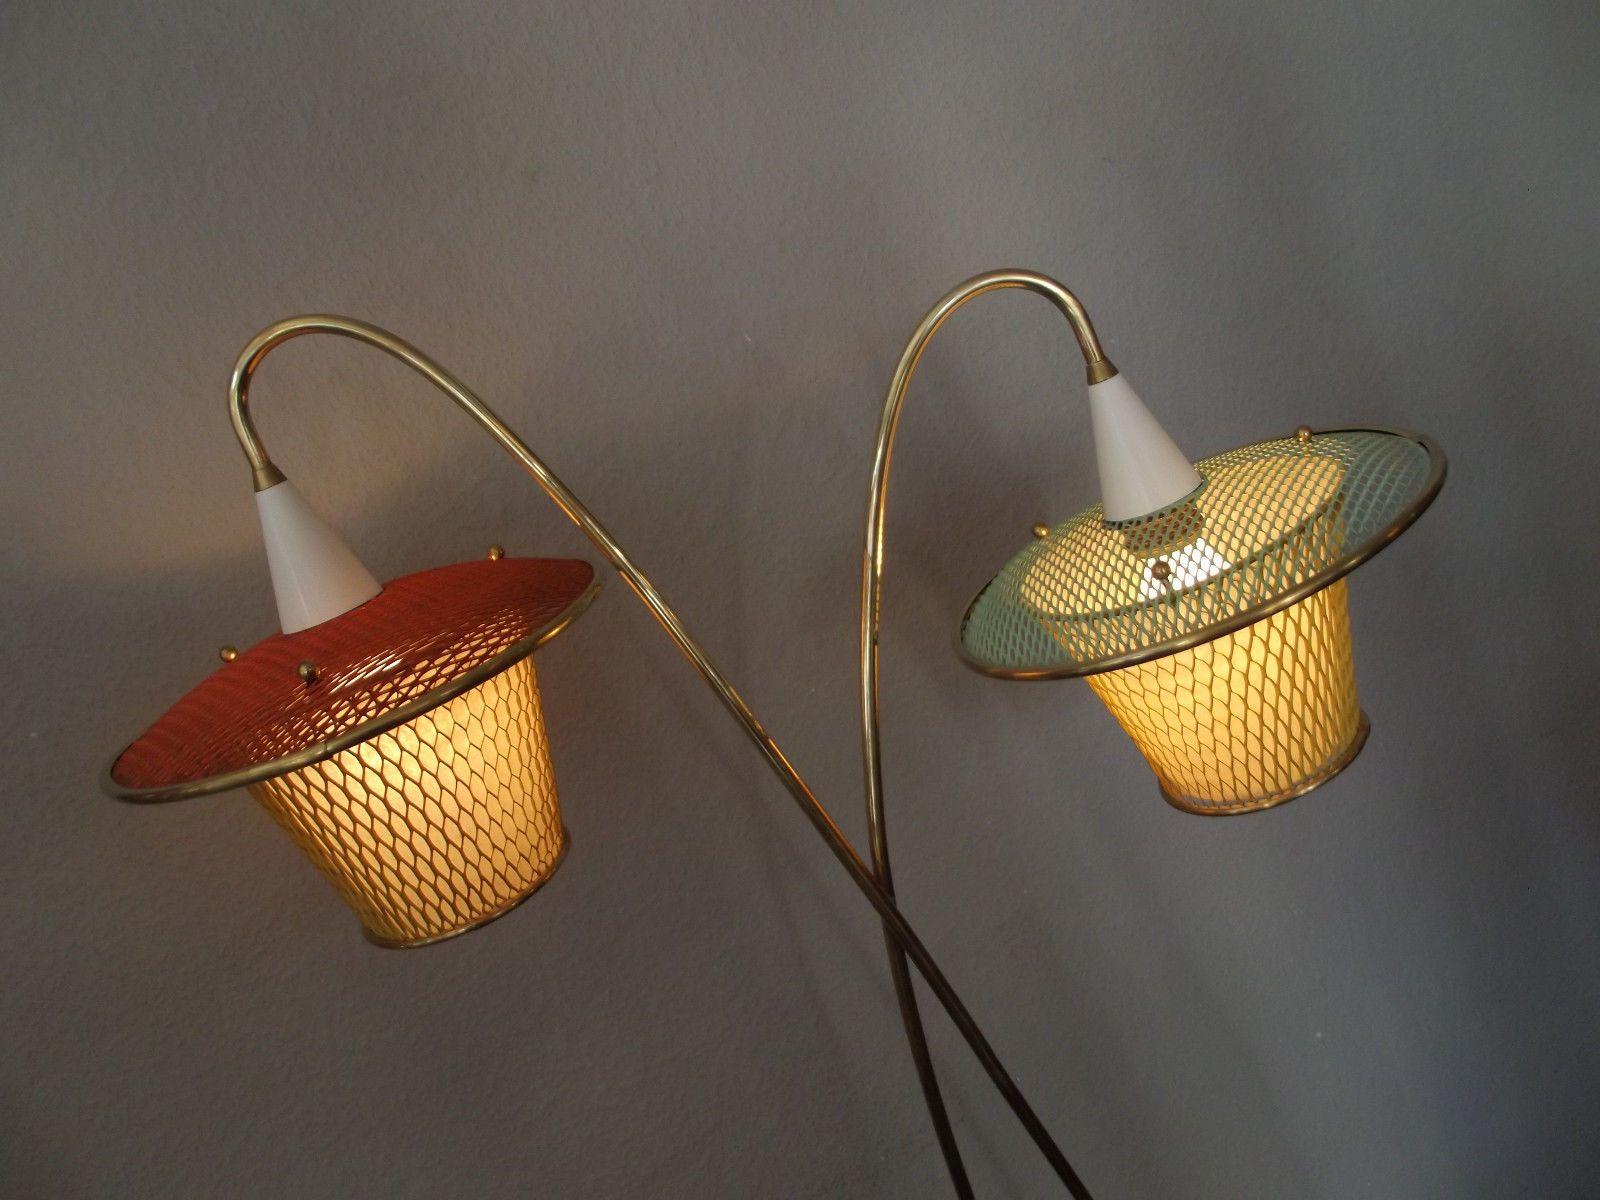 tolle 50s/60s STEHLAMPE 50er/60er Sputnik, nierentisch tütenlampe in ...